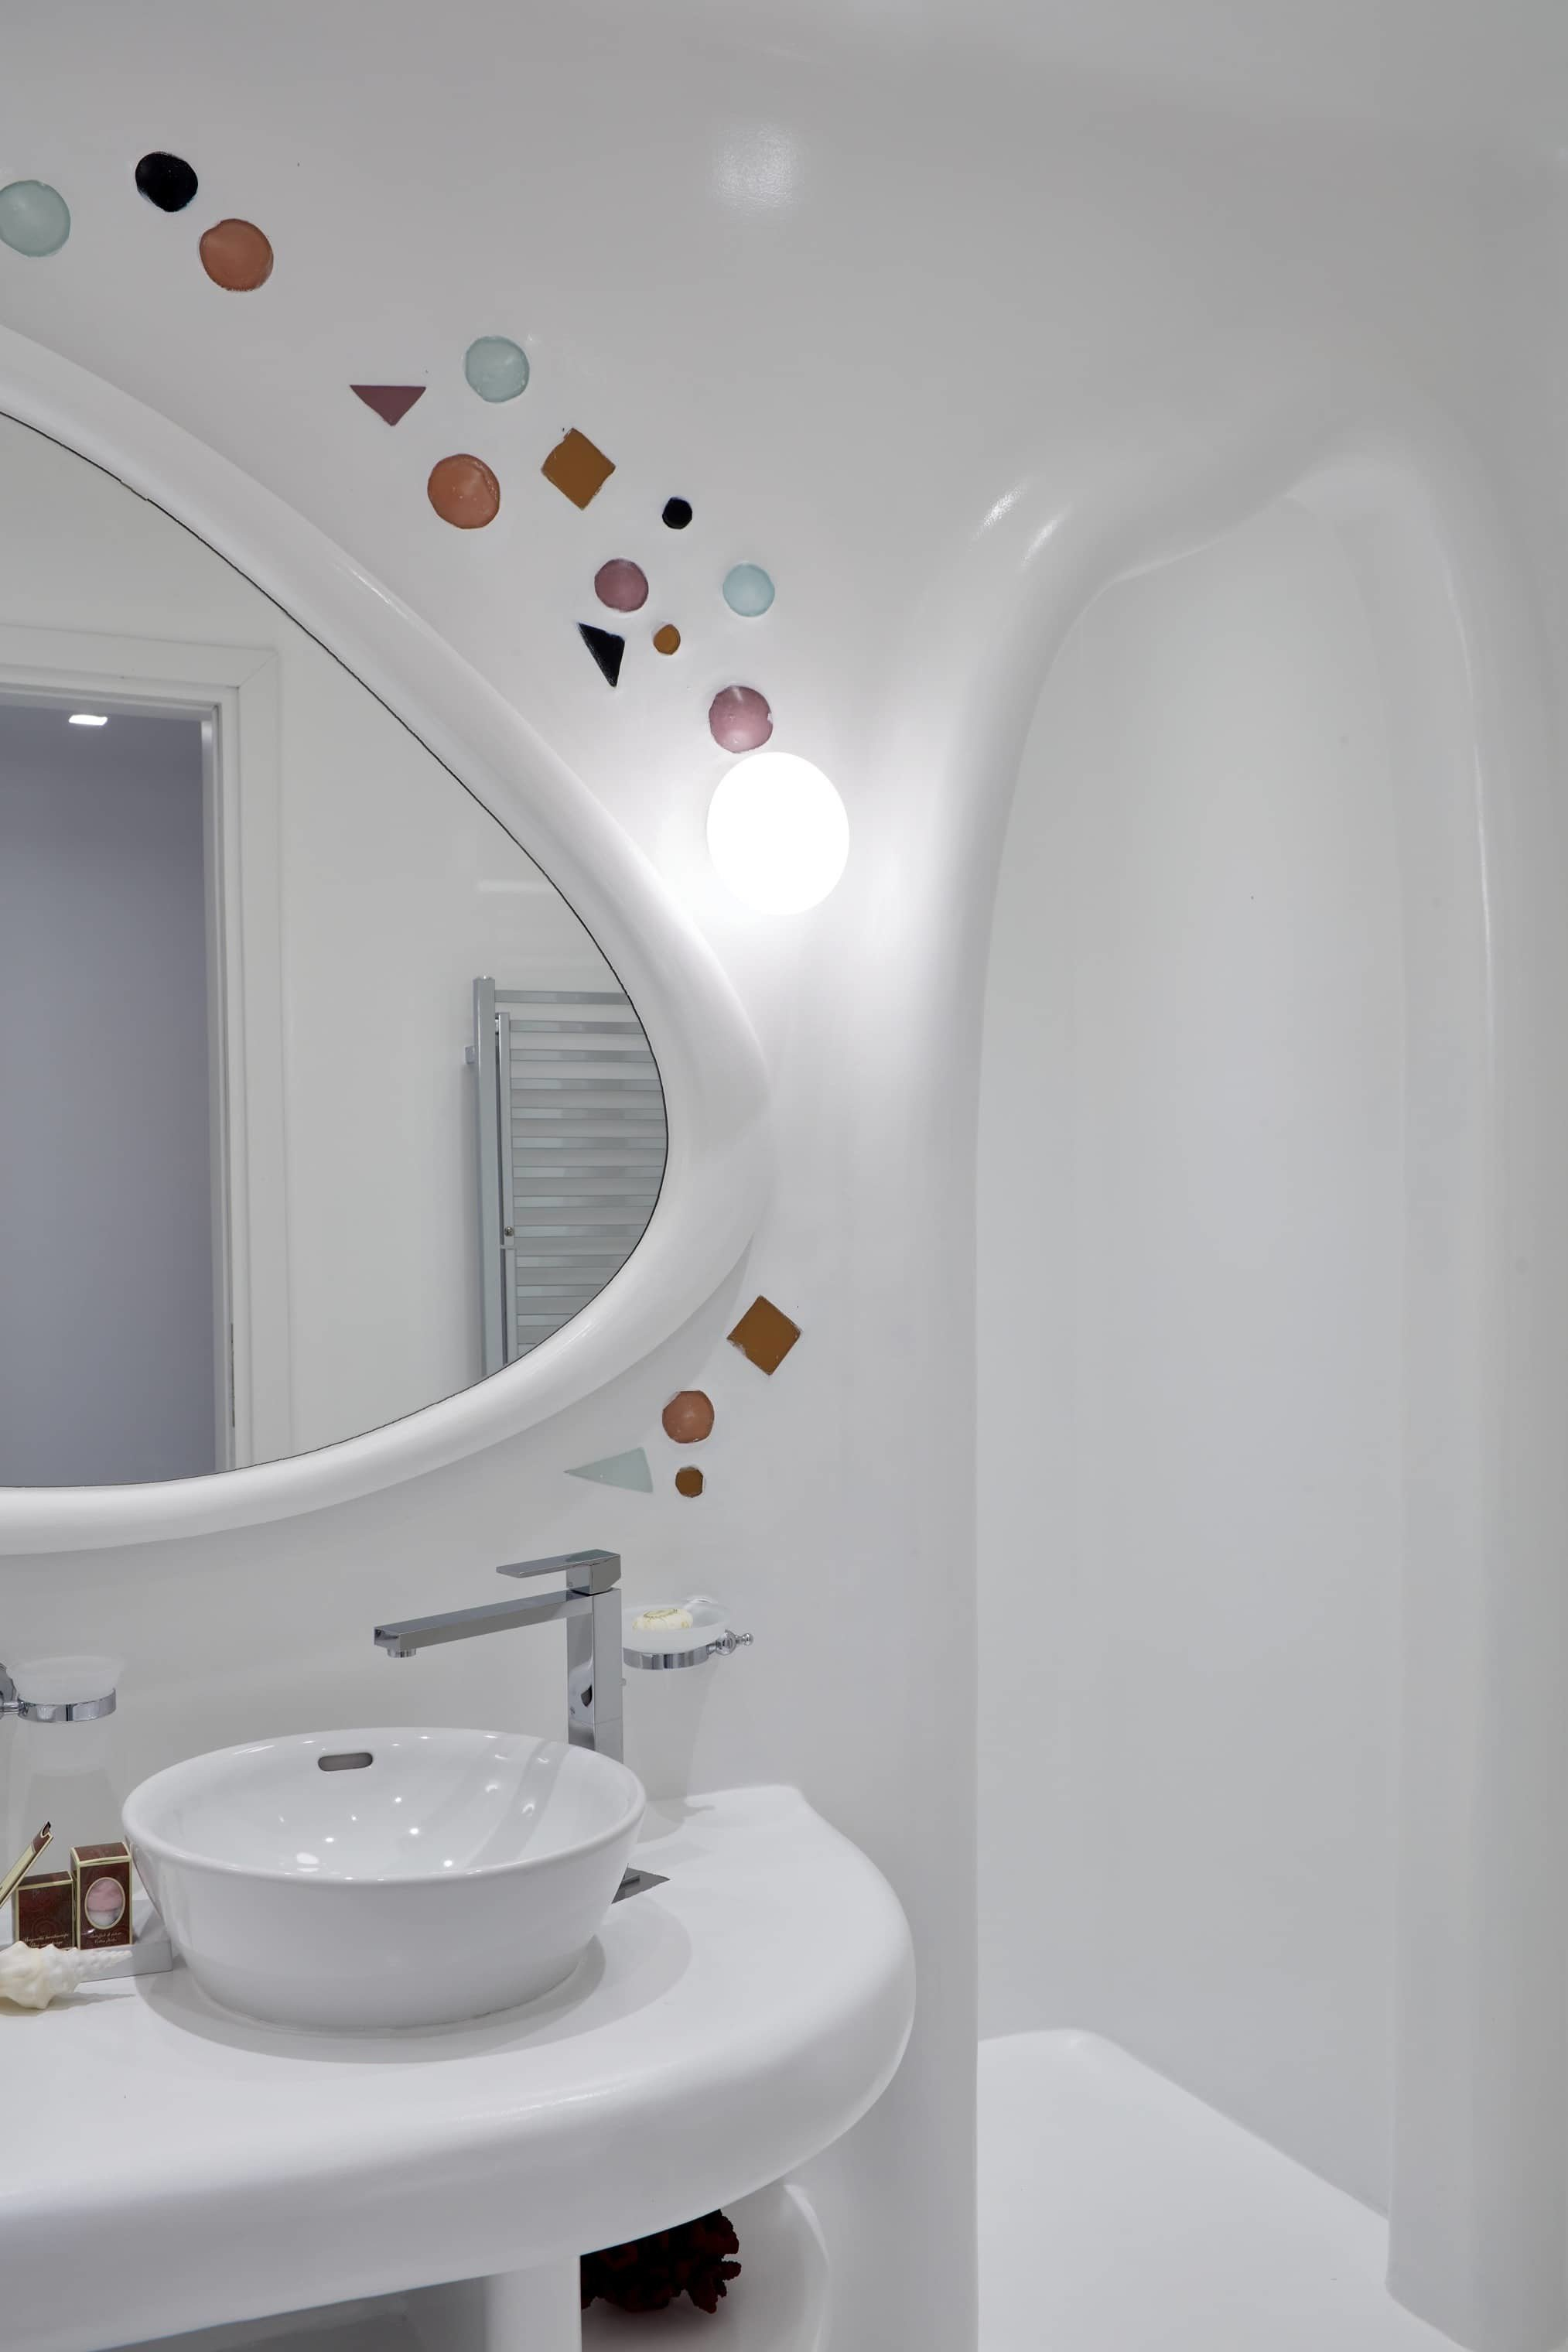 Food + Drink Hotels Trip Ideas wall indoor bathroom tap room sink toilet seat interior design plumbing fixture white product design bathroom sink bidet toilet angle ceramic ceiling